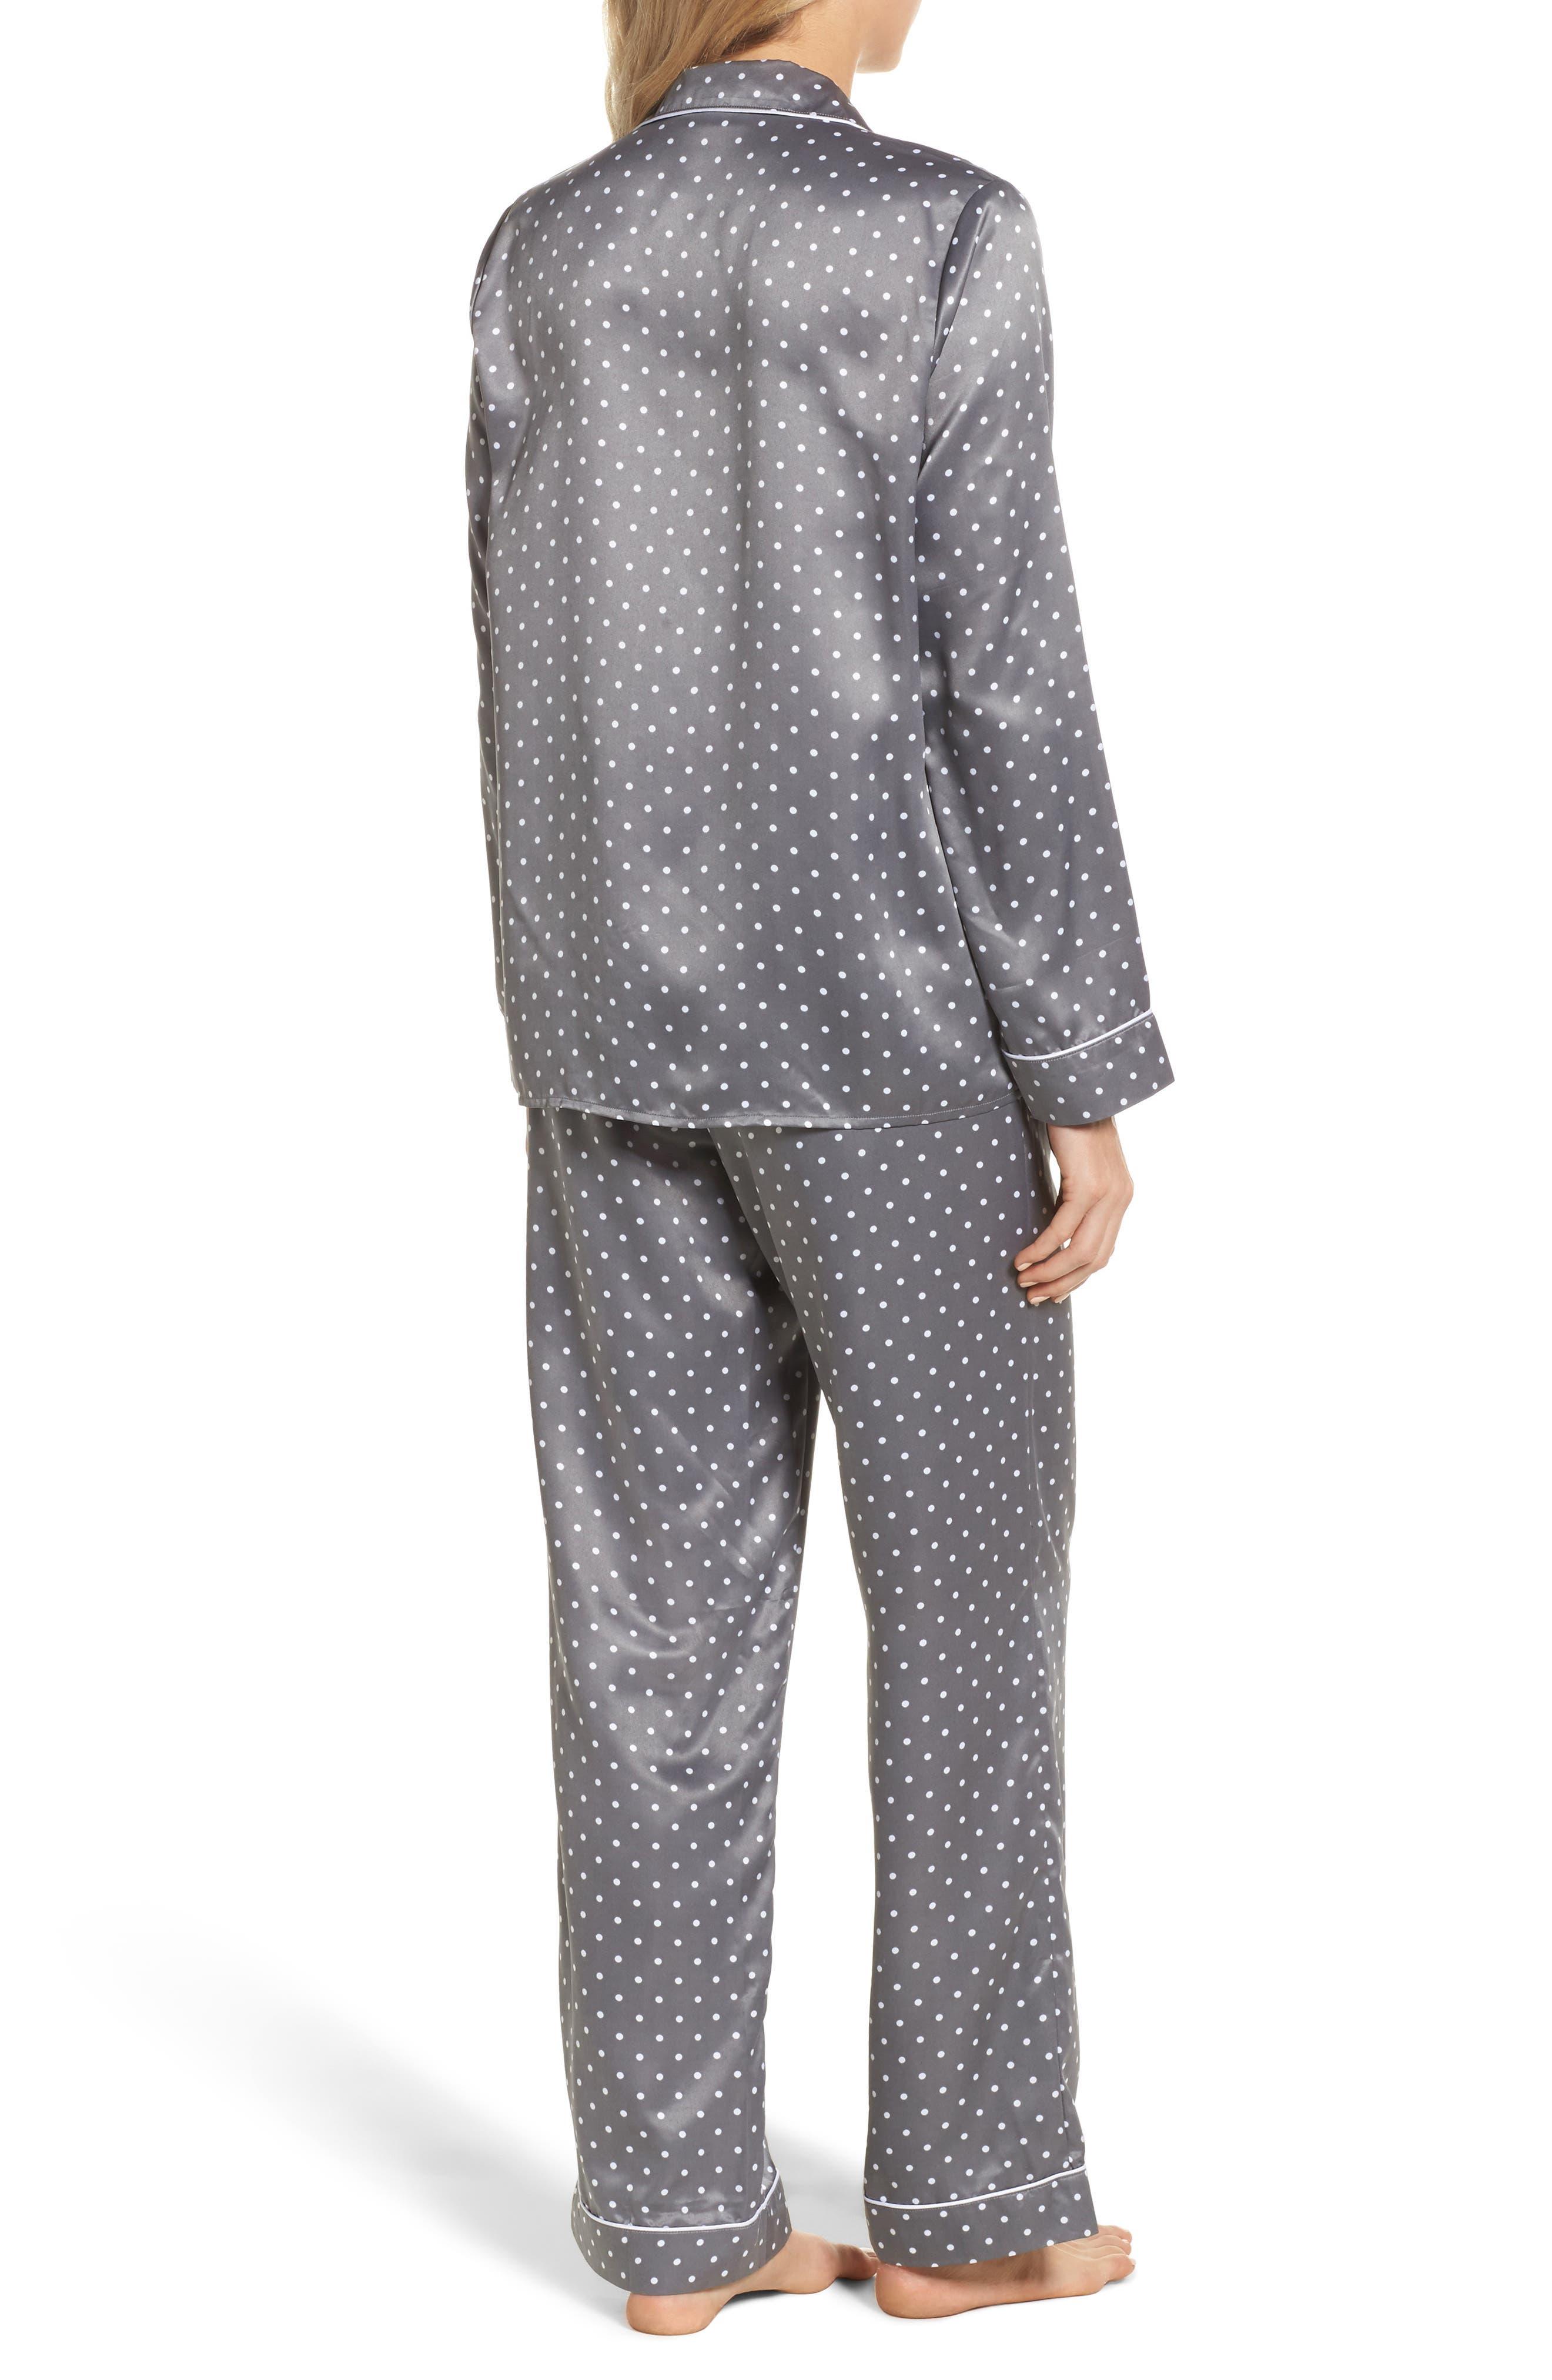 Satin Pajamas,                             Alternate thumbnail 2, color,                             021